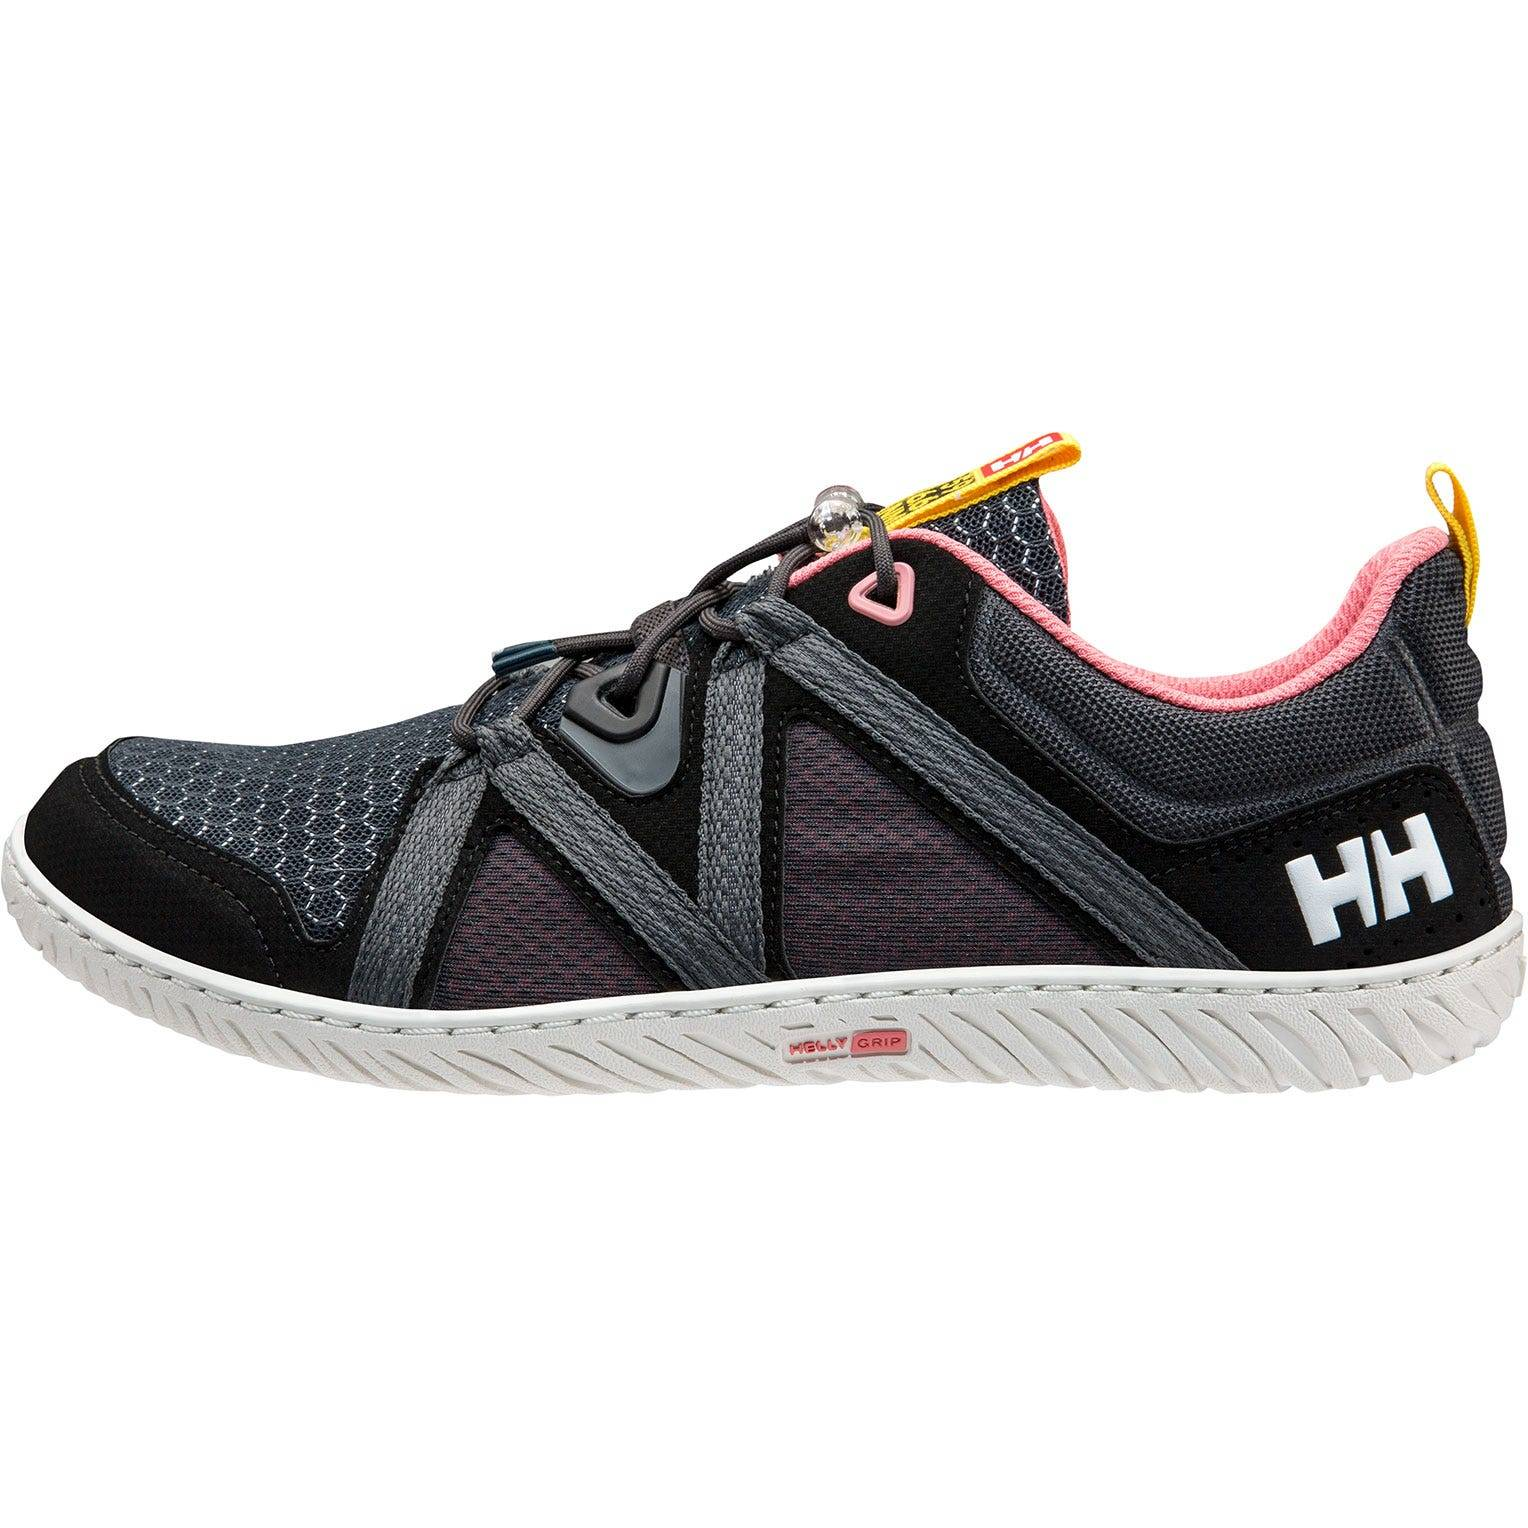 Helly Hansen W Hp Foil F1 Womens Sailing Shoe Black 40/8.5